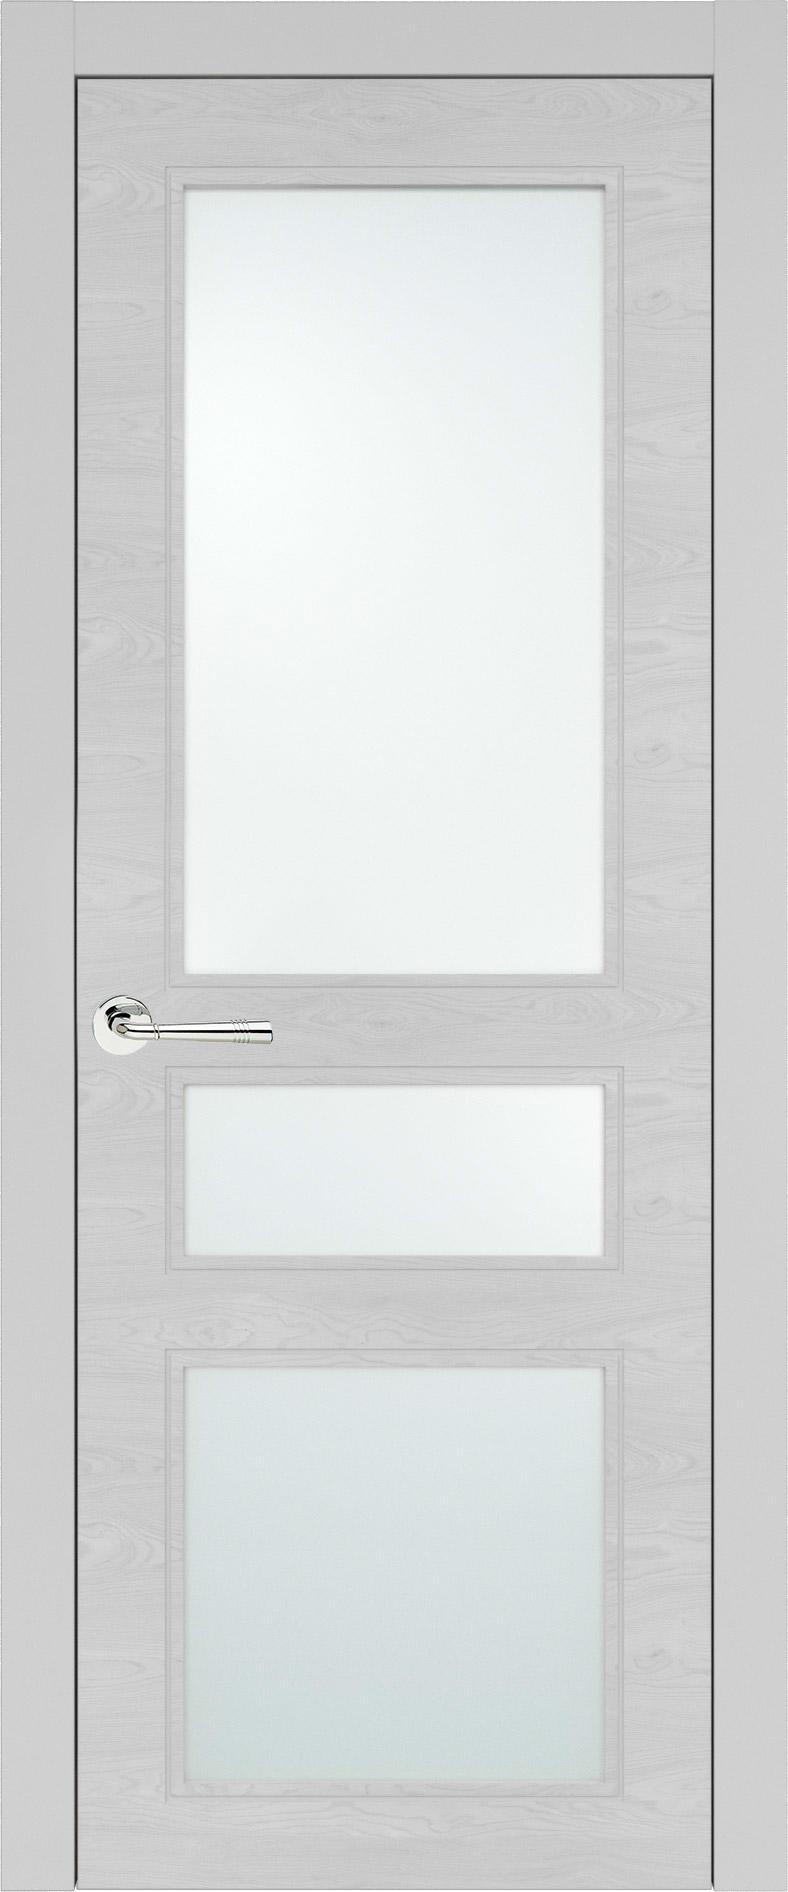 Imperia-R Neo Classic цвет - Серая эмаль по шпону (RAL 7047) Со стеклом (ДО)